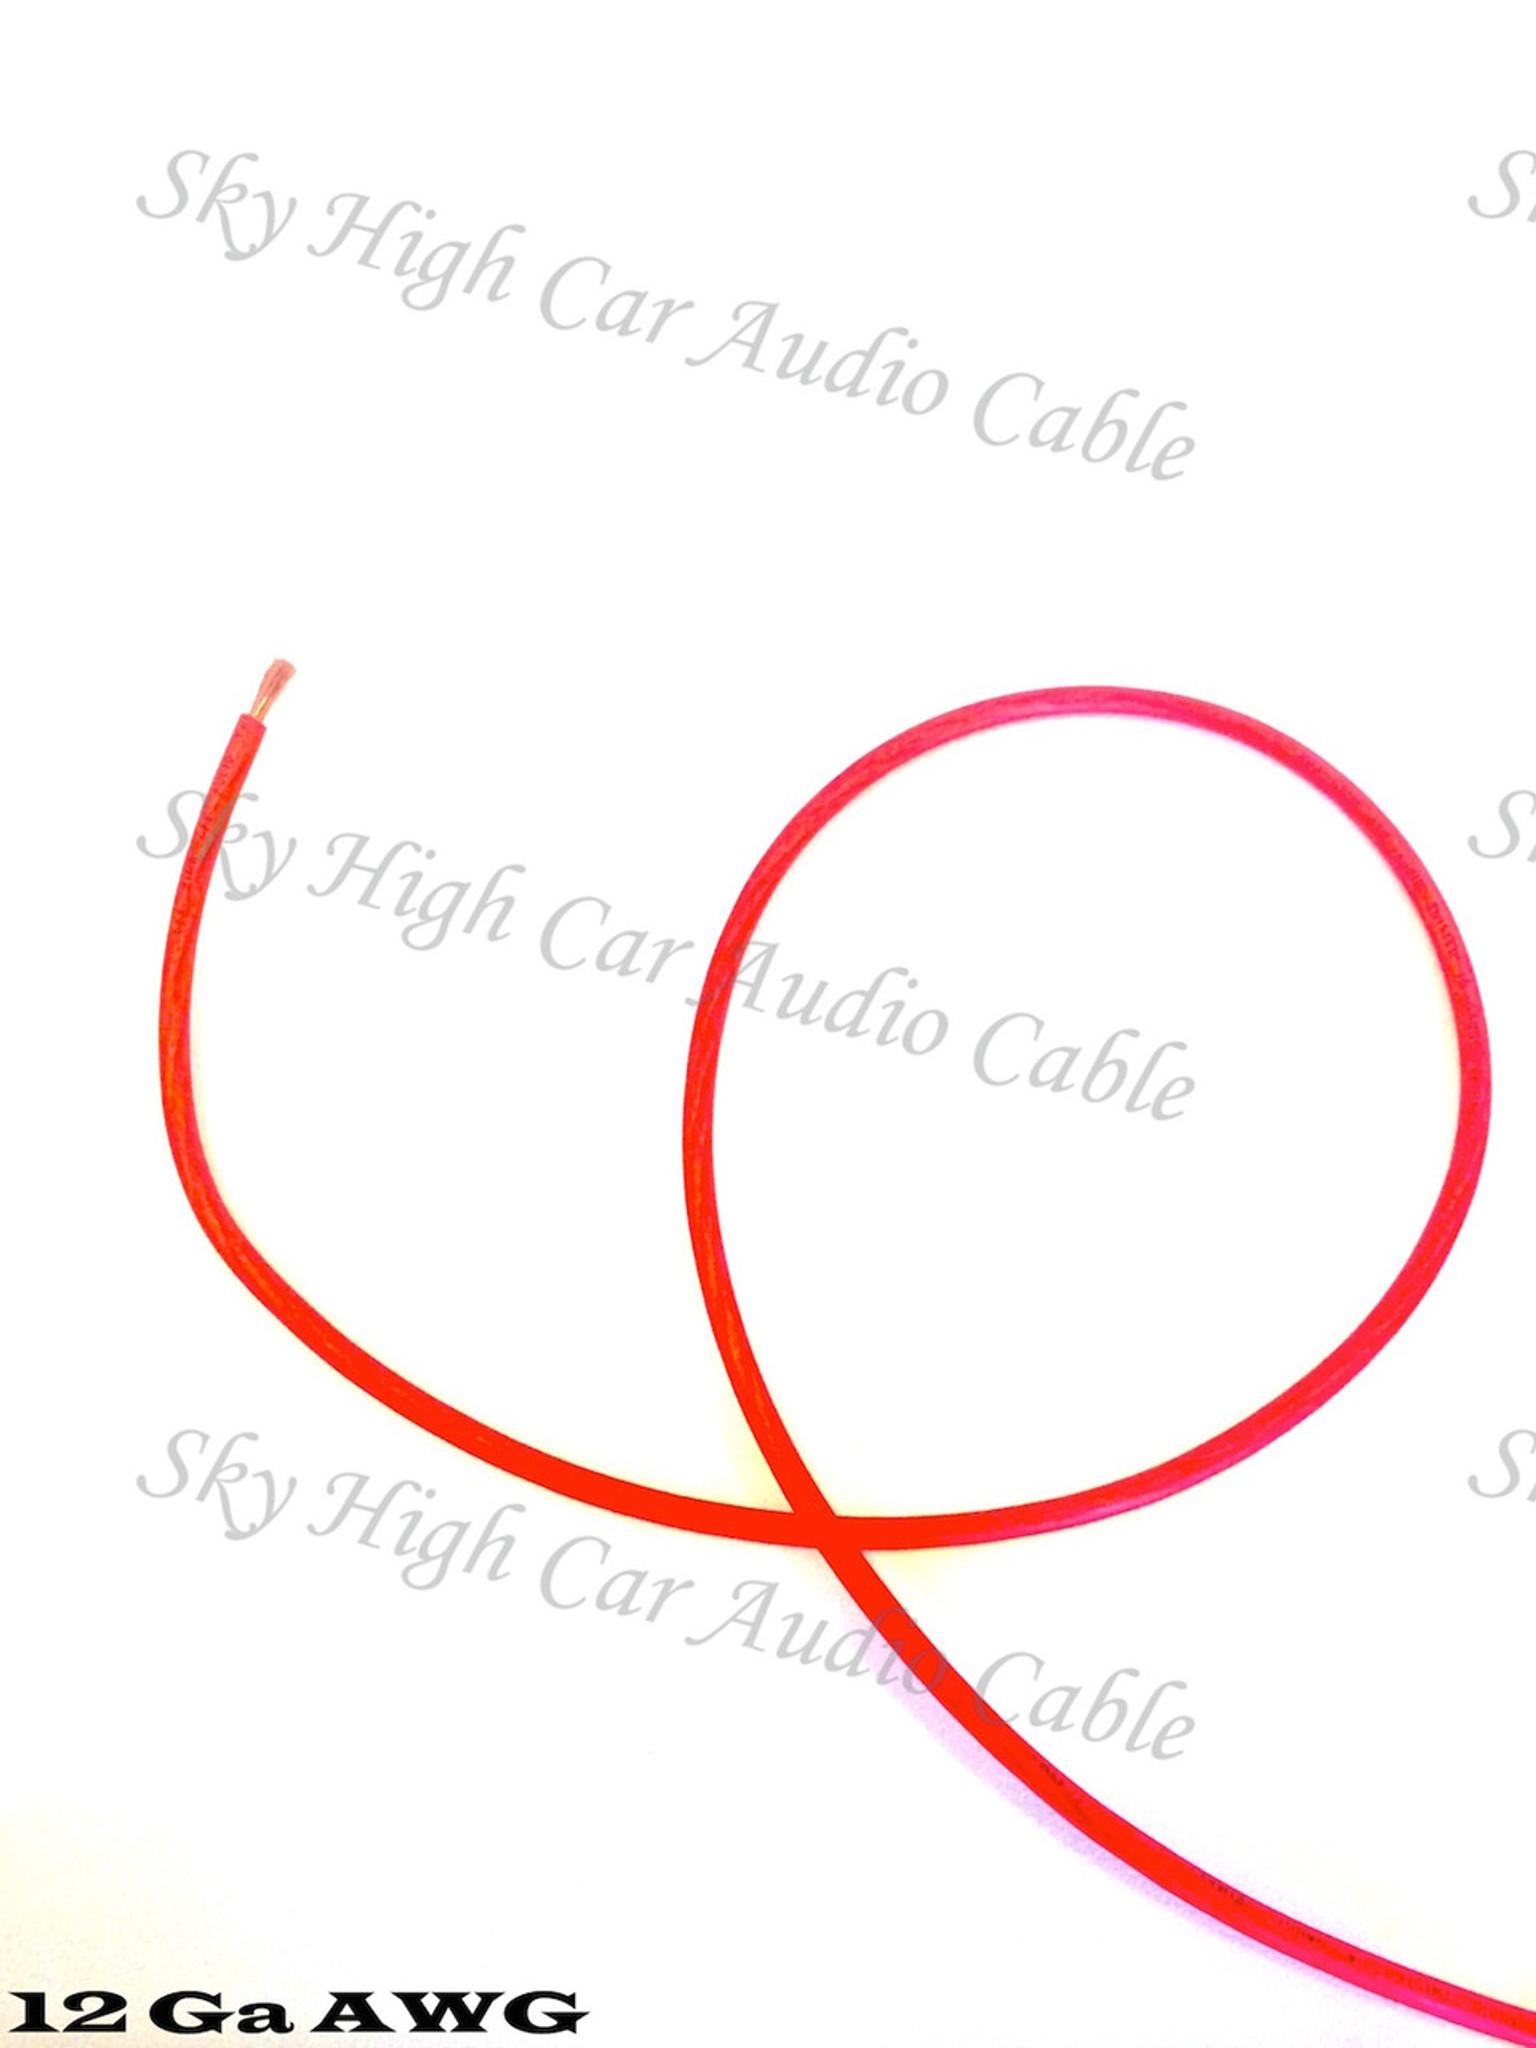 sky phone line wiring diagram sky high car audio cca 12 gauge primary wire 500ft spool  sky high car audio cca 12 gauge primary